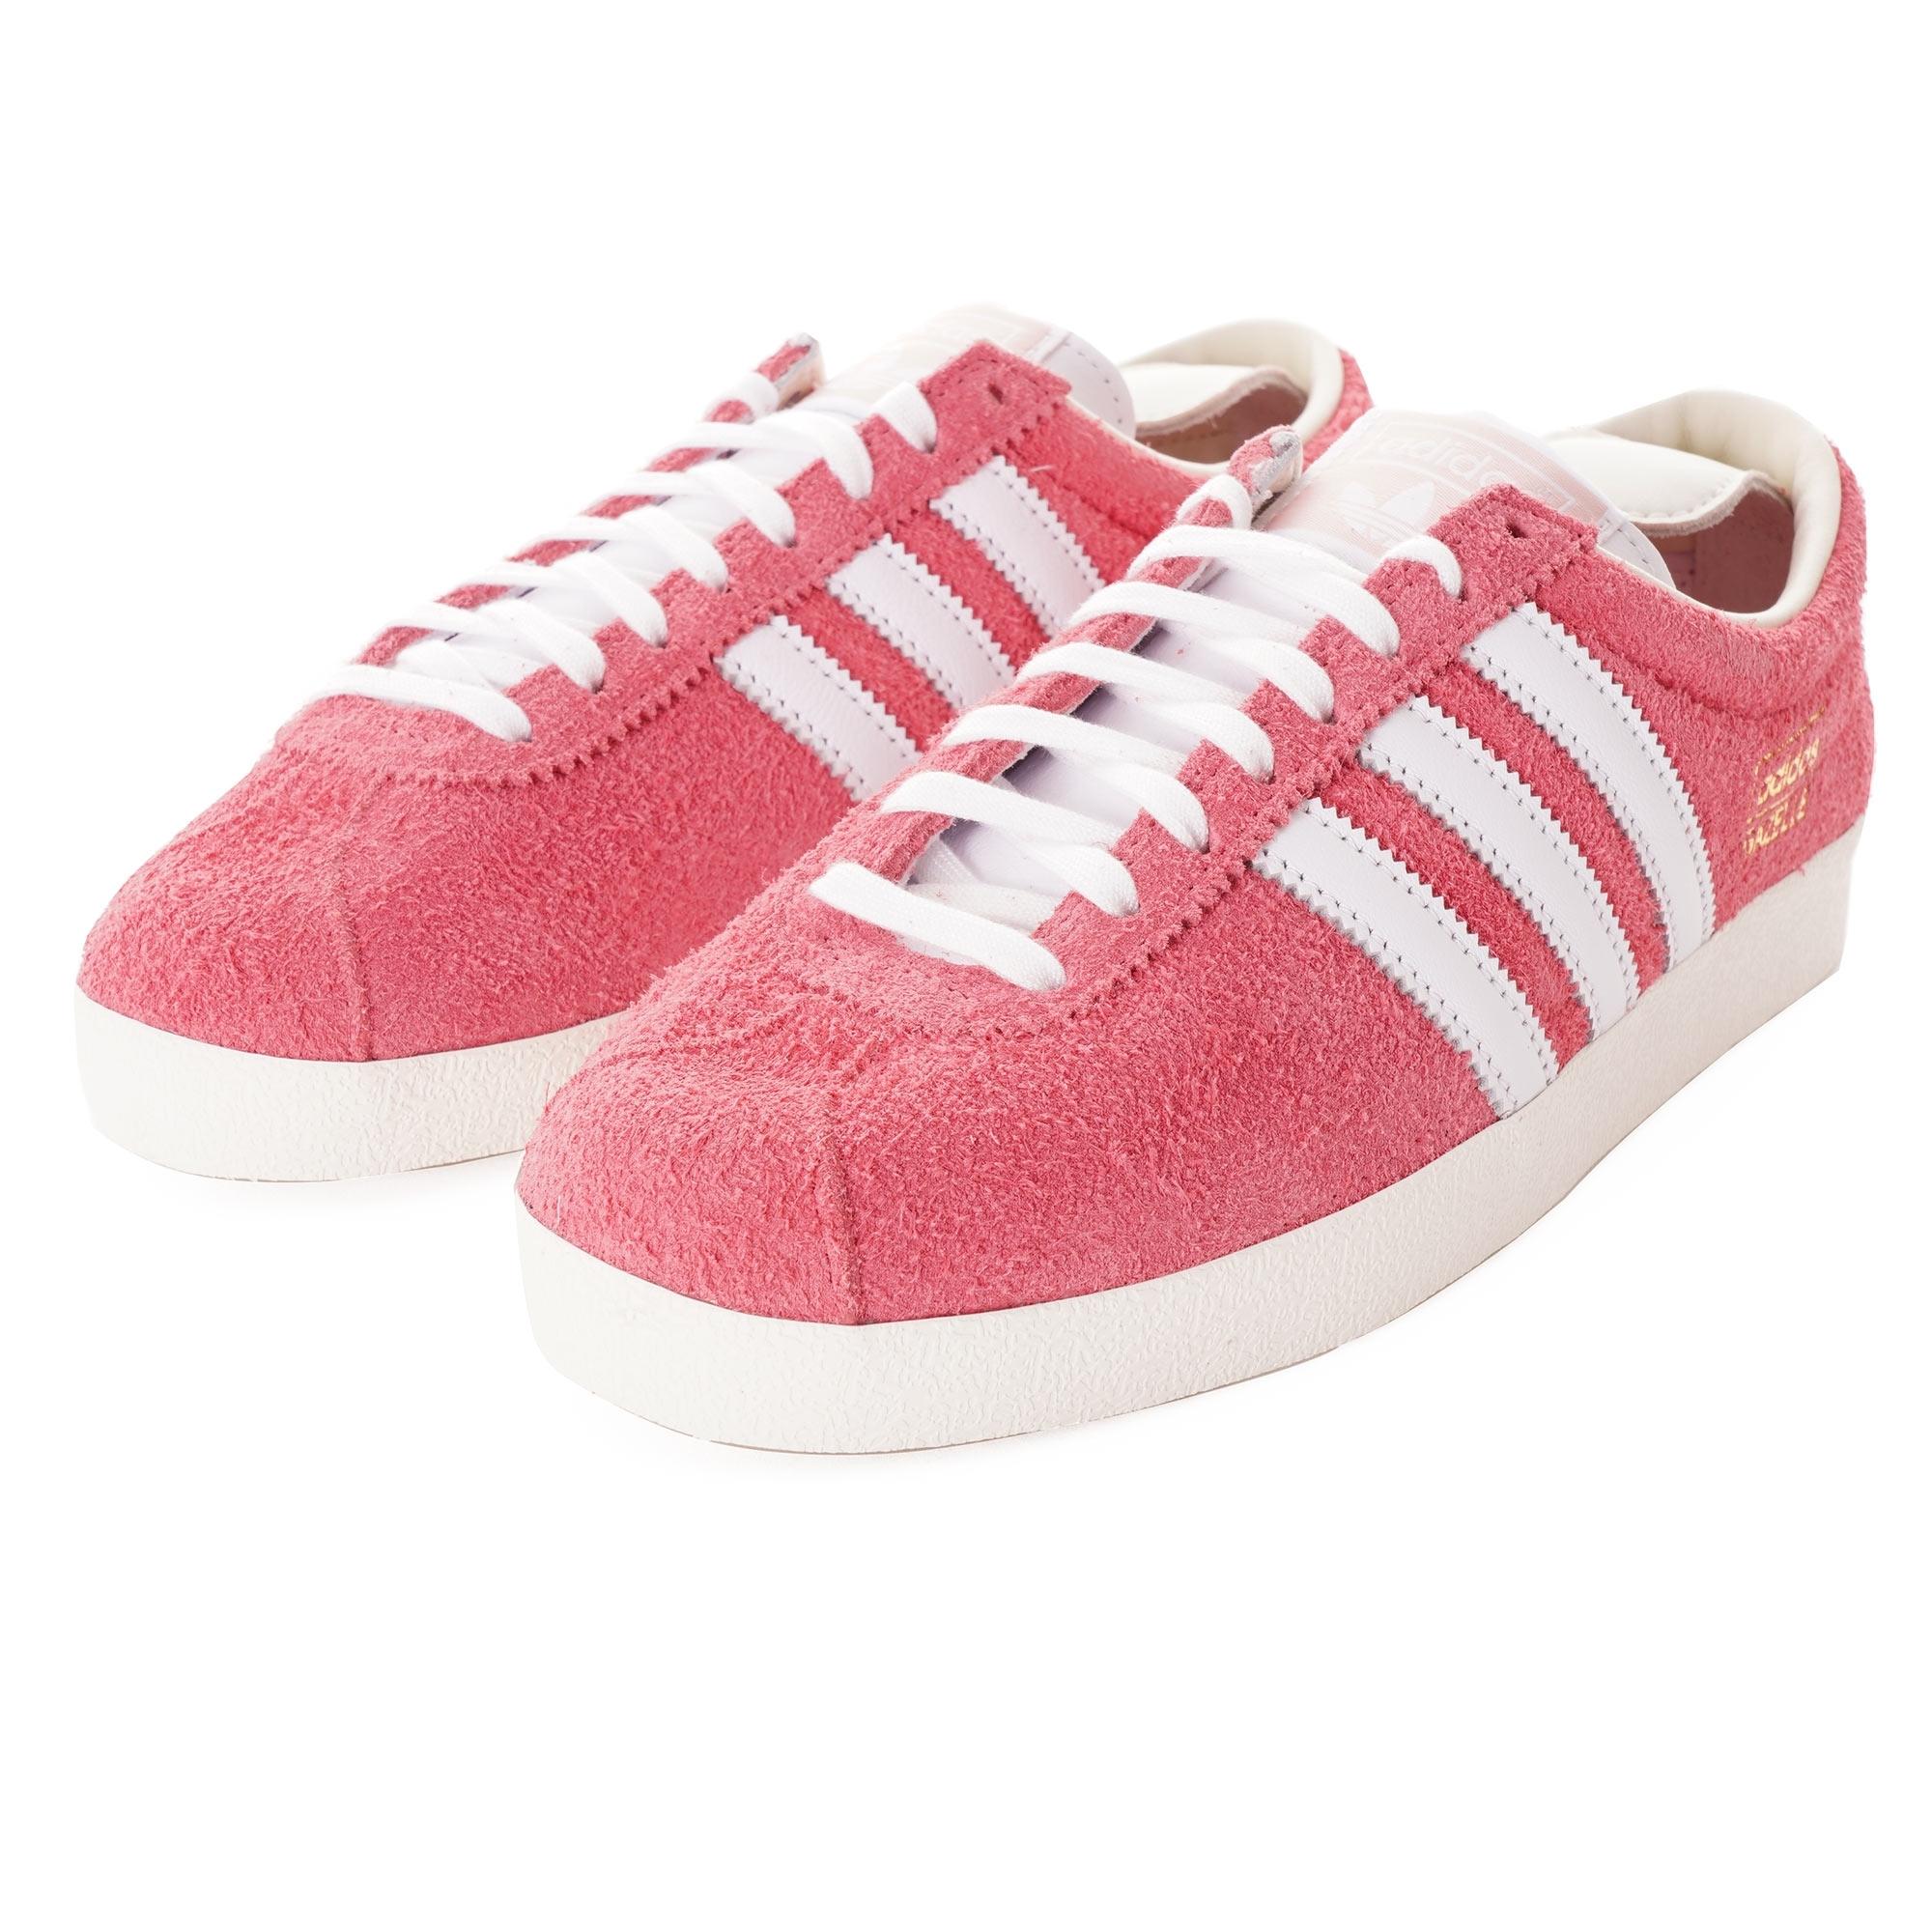 adidas Originals Gazelle Vintage | Pink